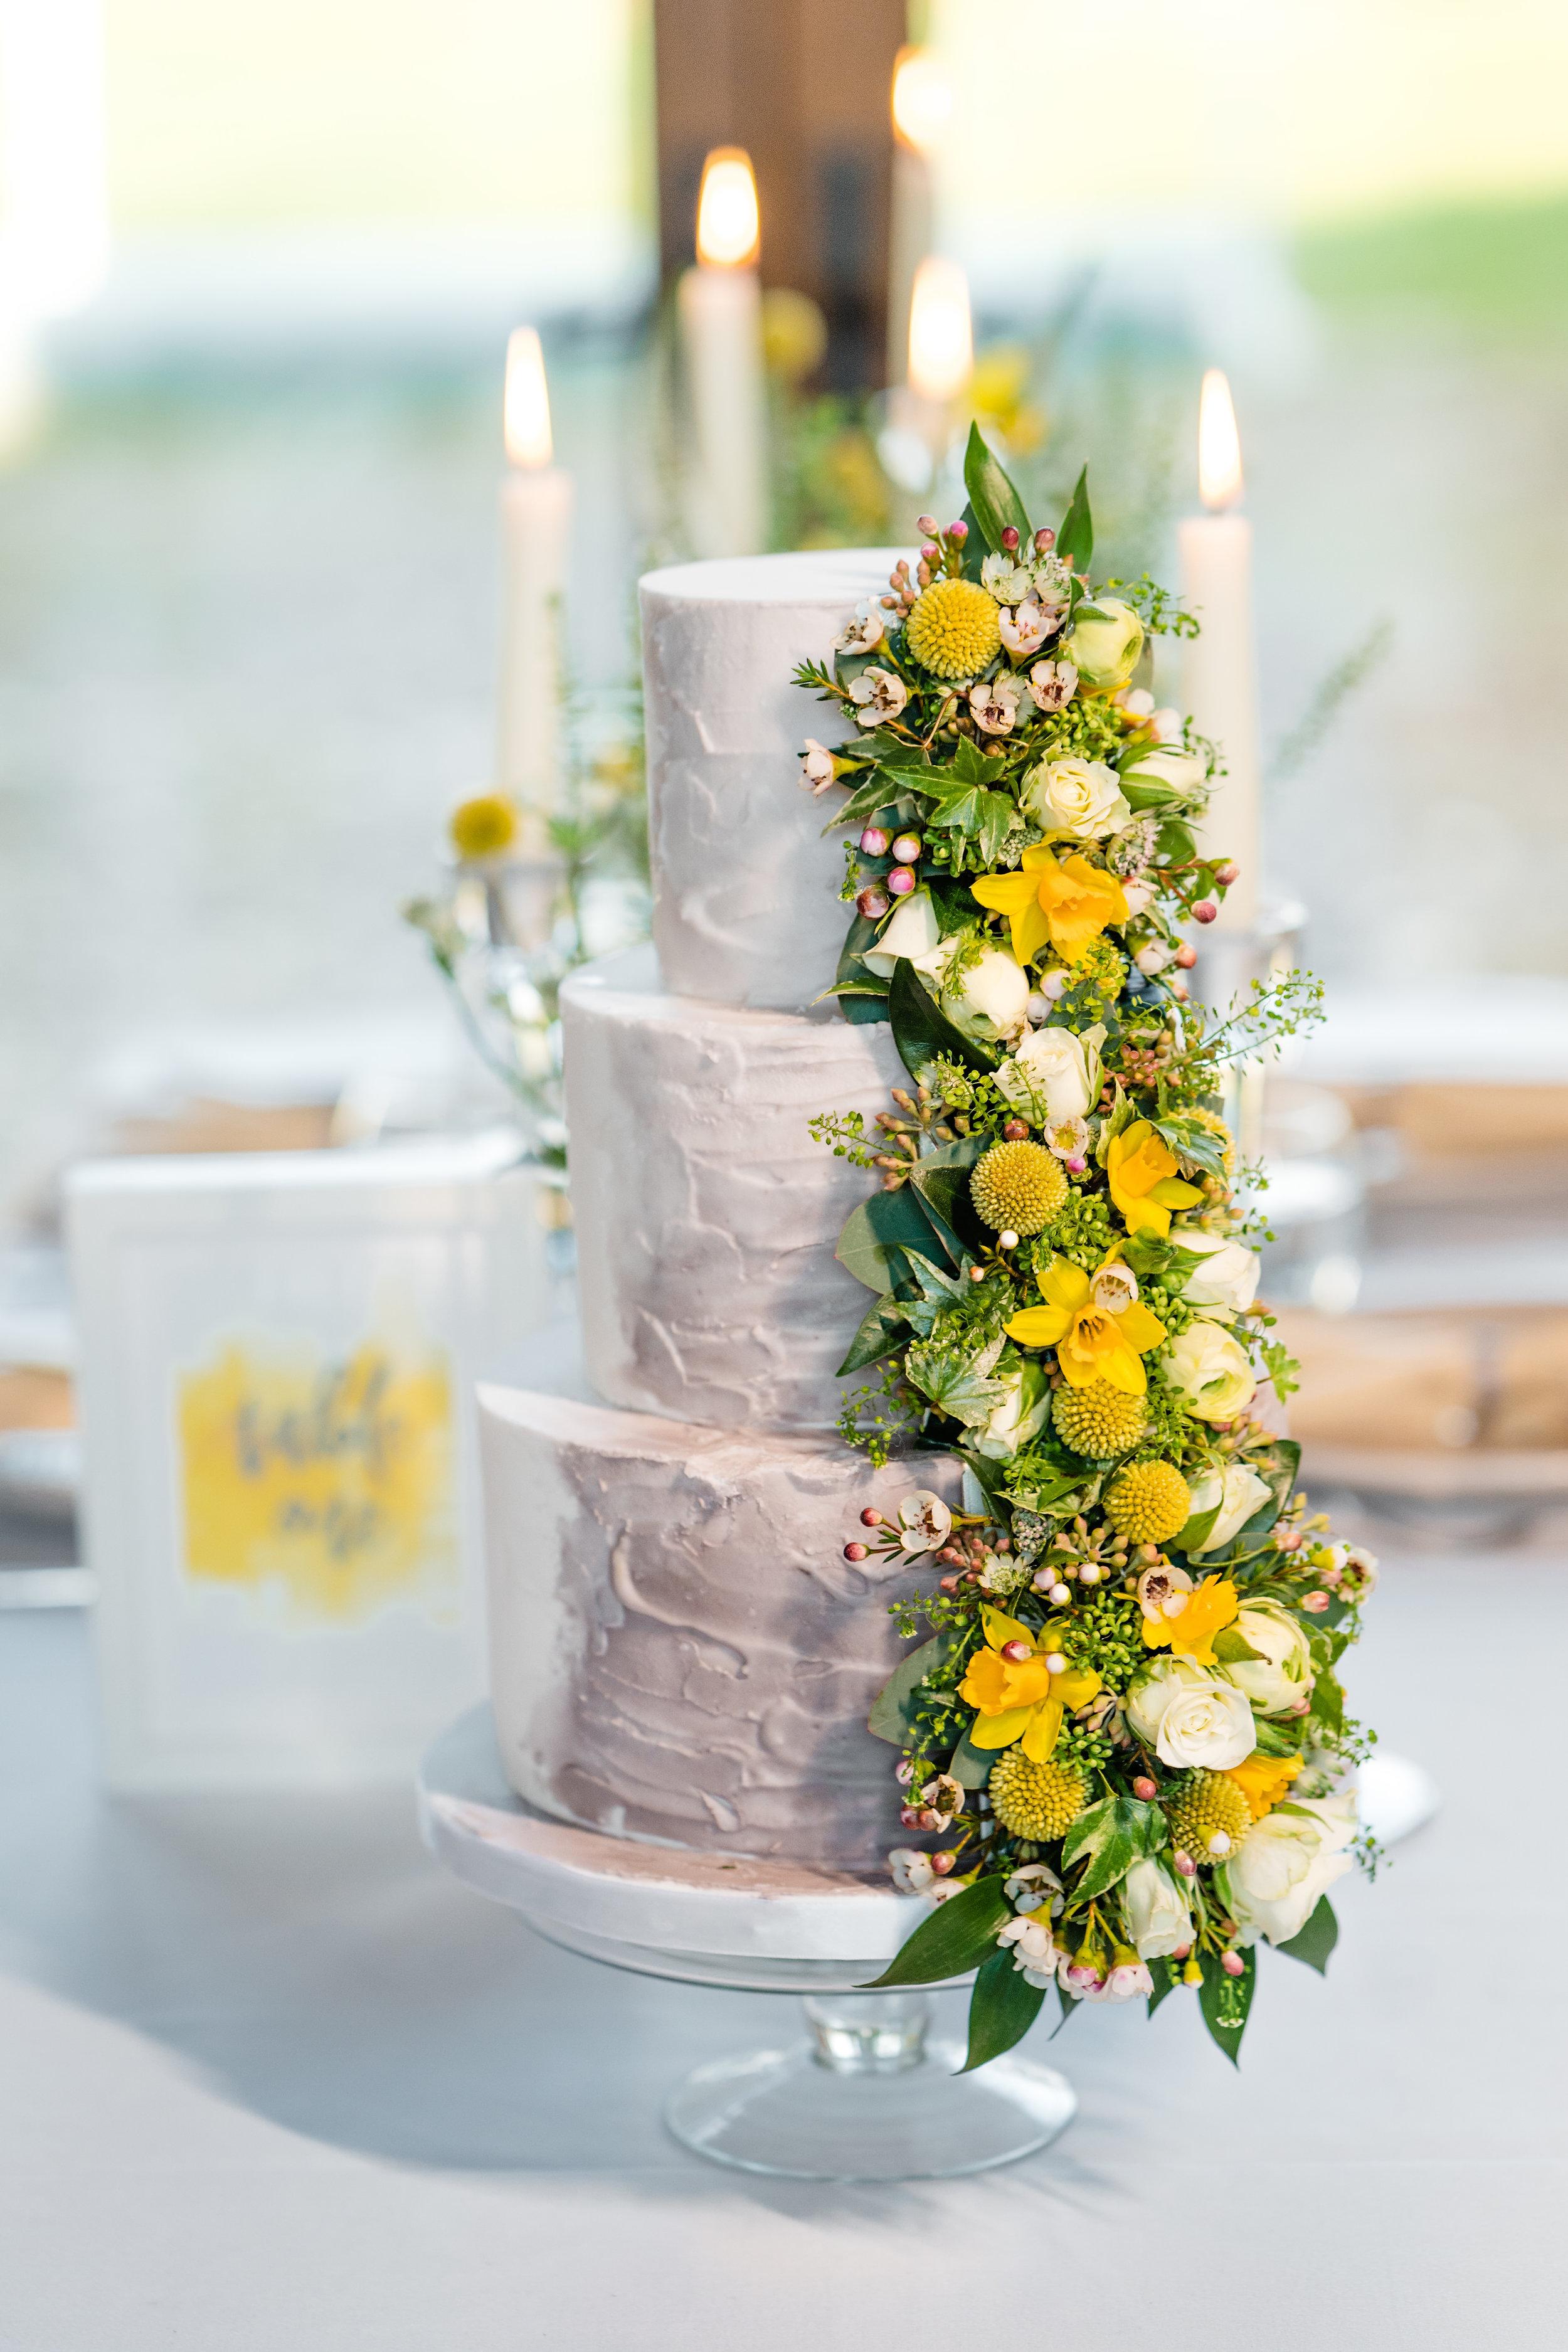 IMG_wedding_cake_with_yellow_flowers.jpg